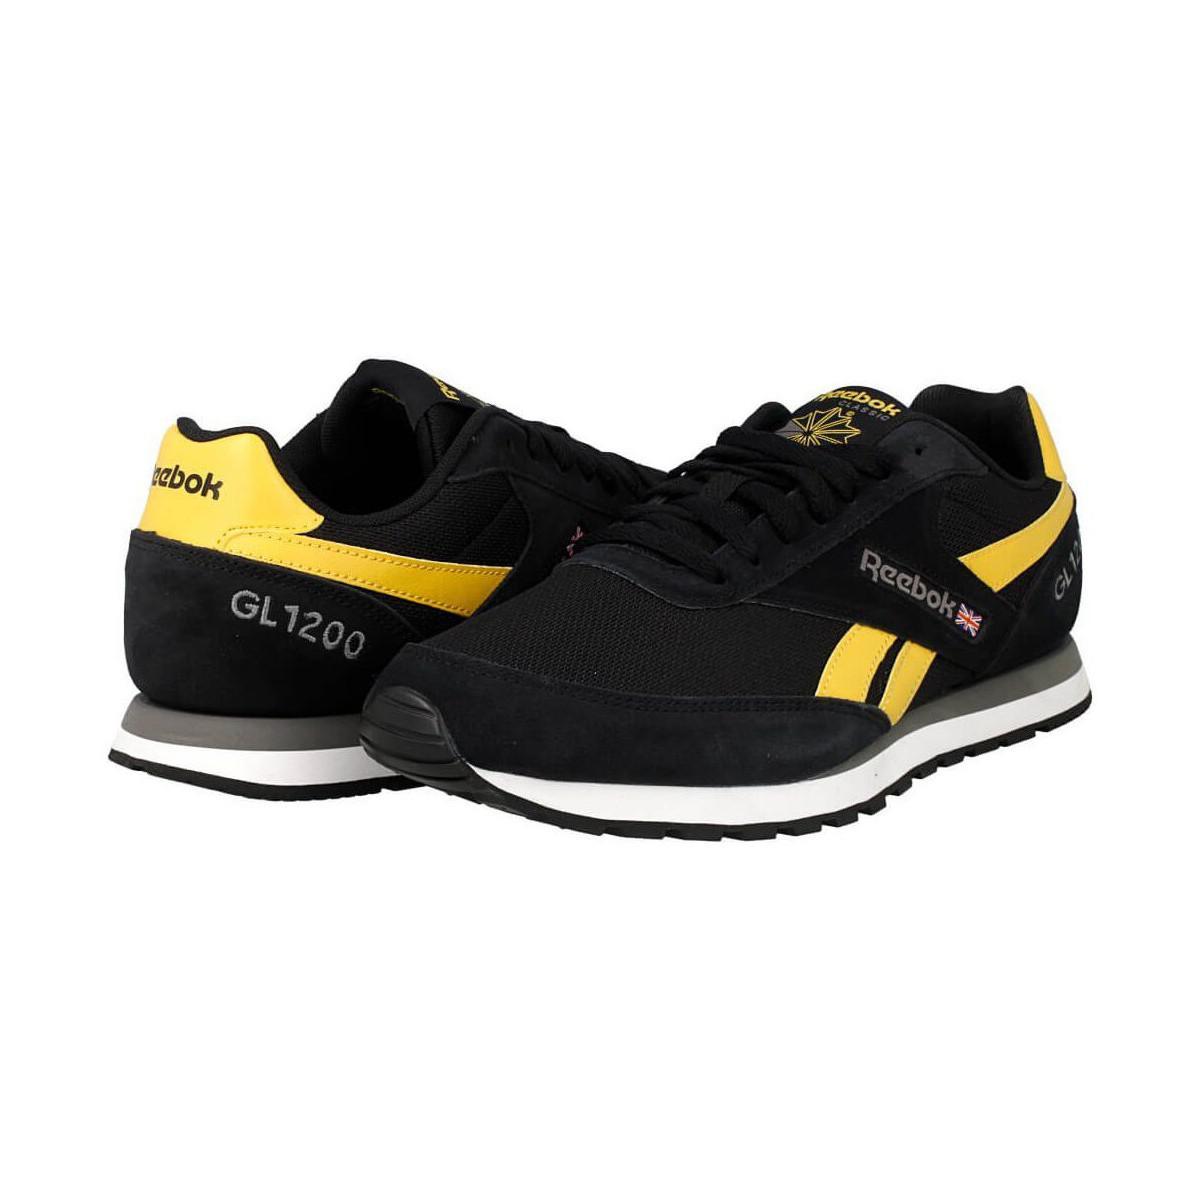 Reebok Gl 1200 Men's Shoes (trainers) In Black for Men